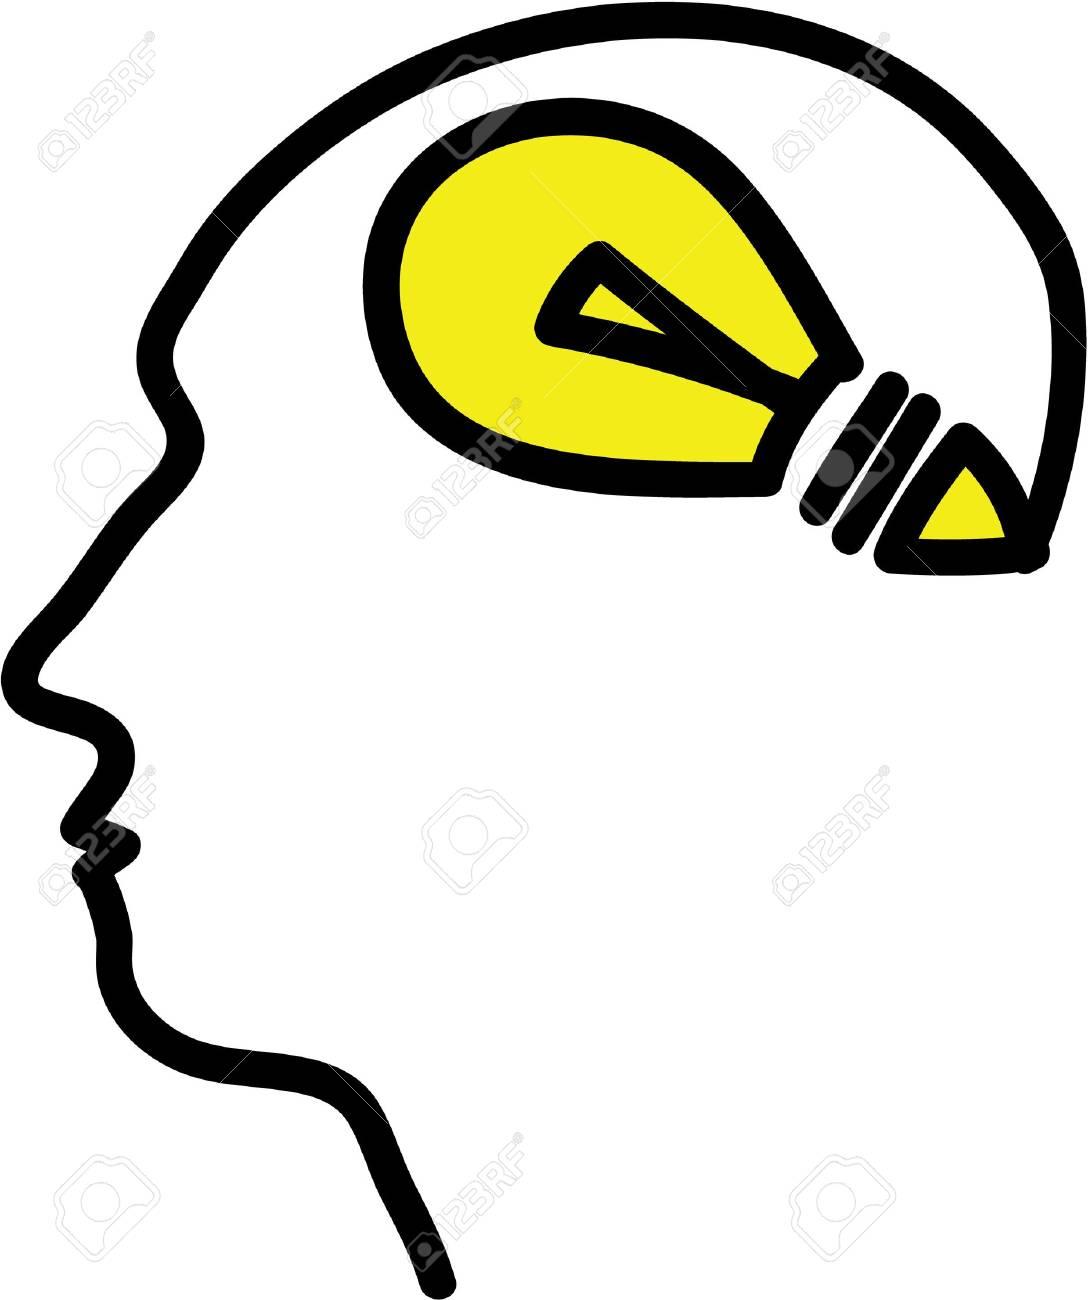 Head with bulb symbol, simple illustration Stock Photo - 20825139